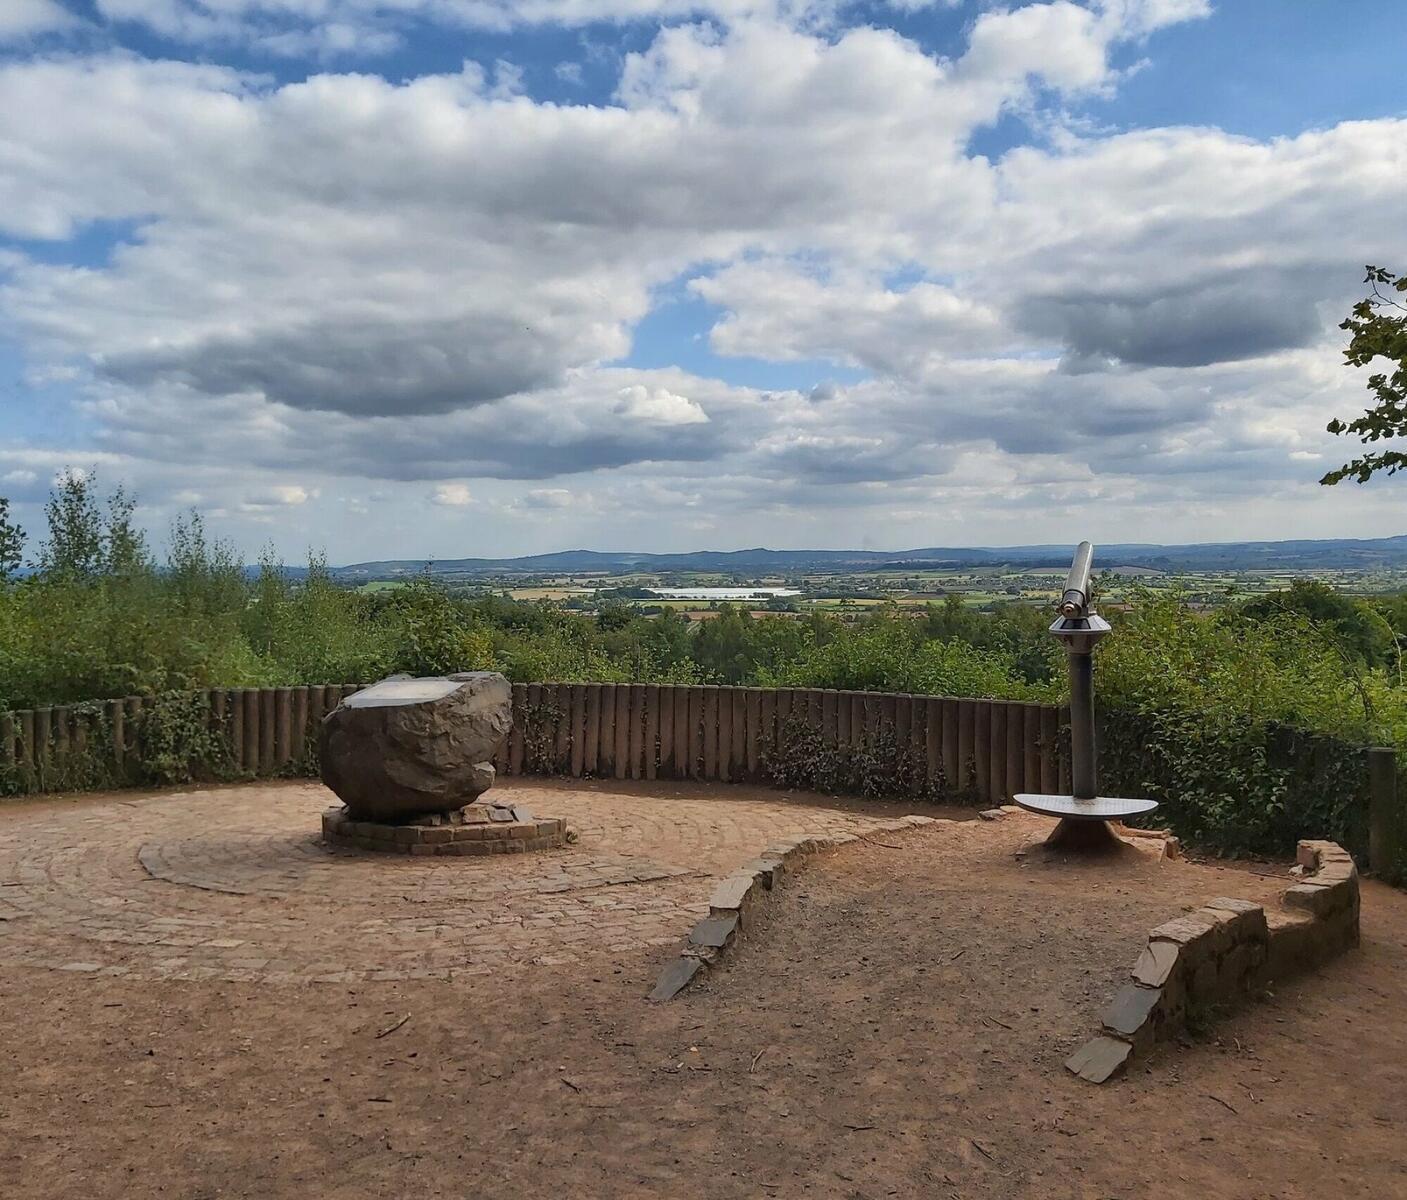 Viewpoint, Queenswood Arboretum